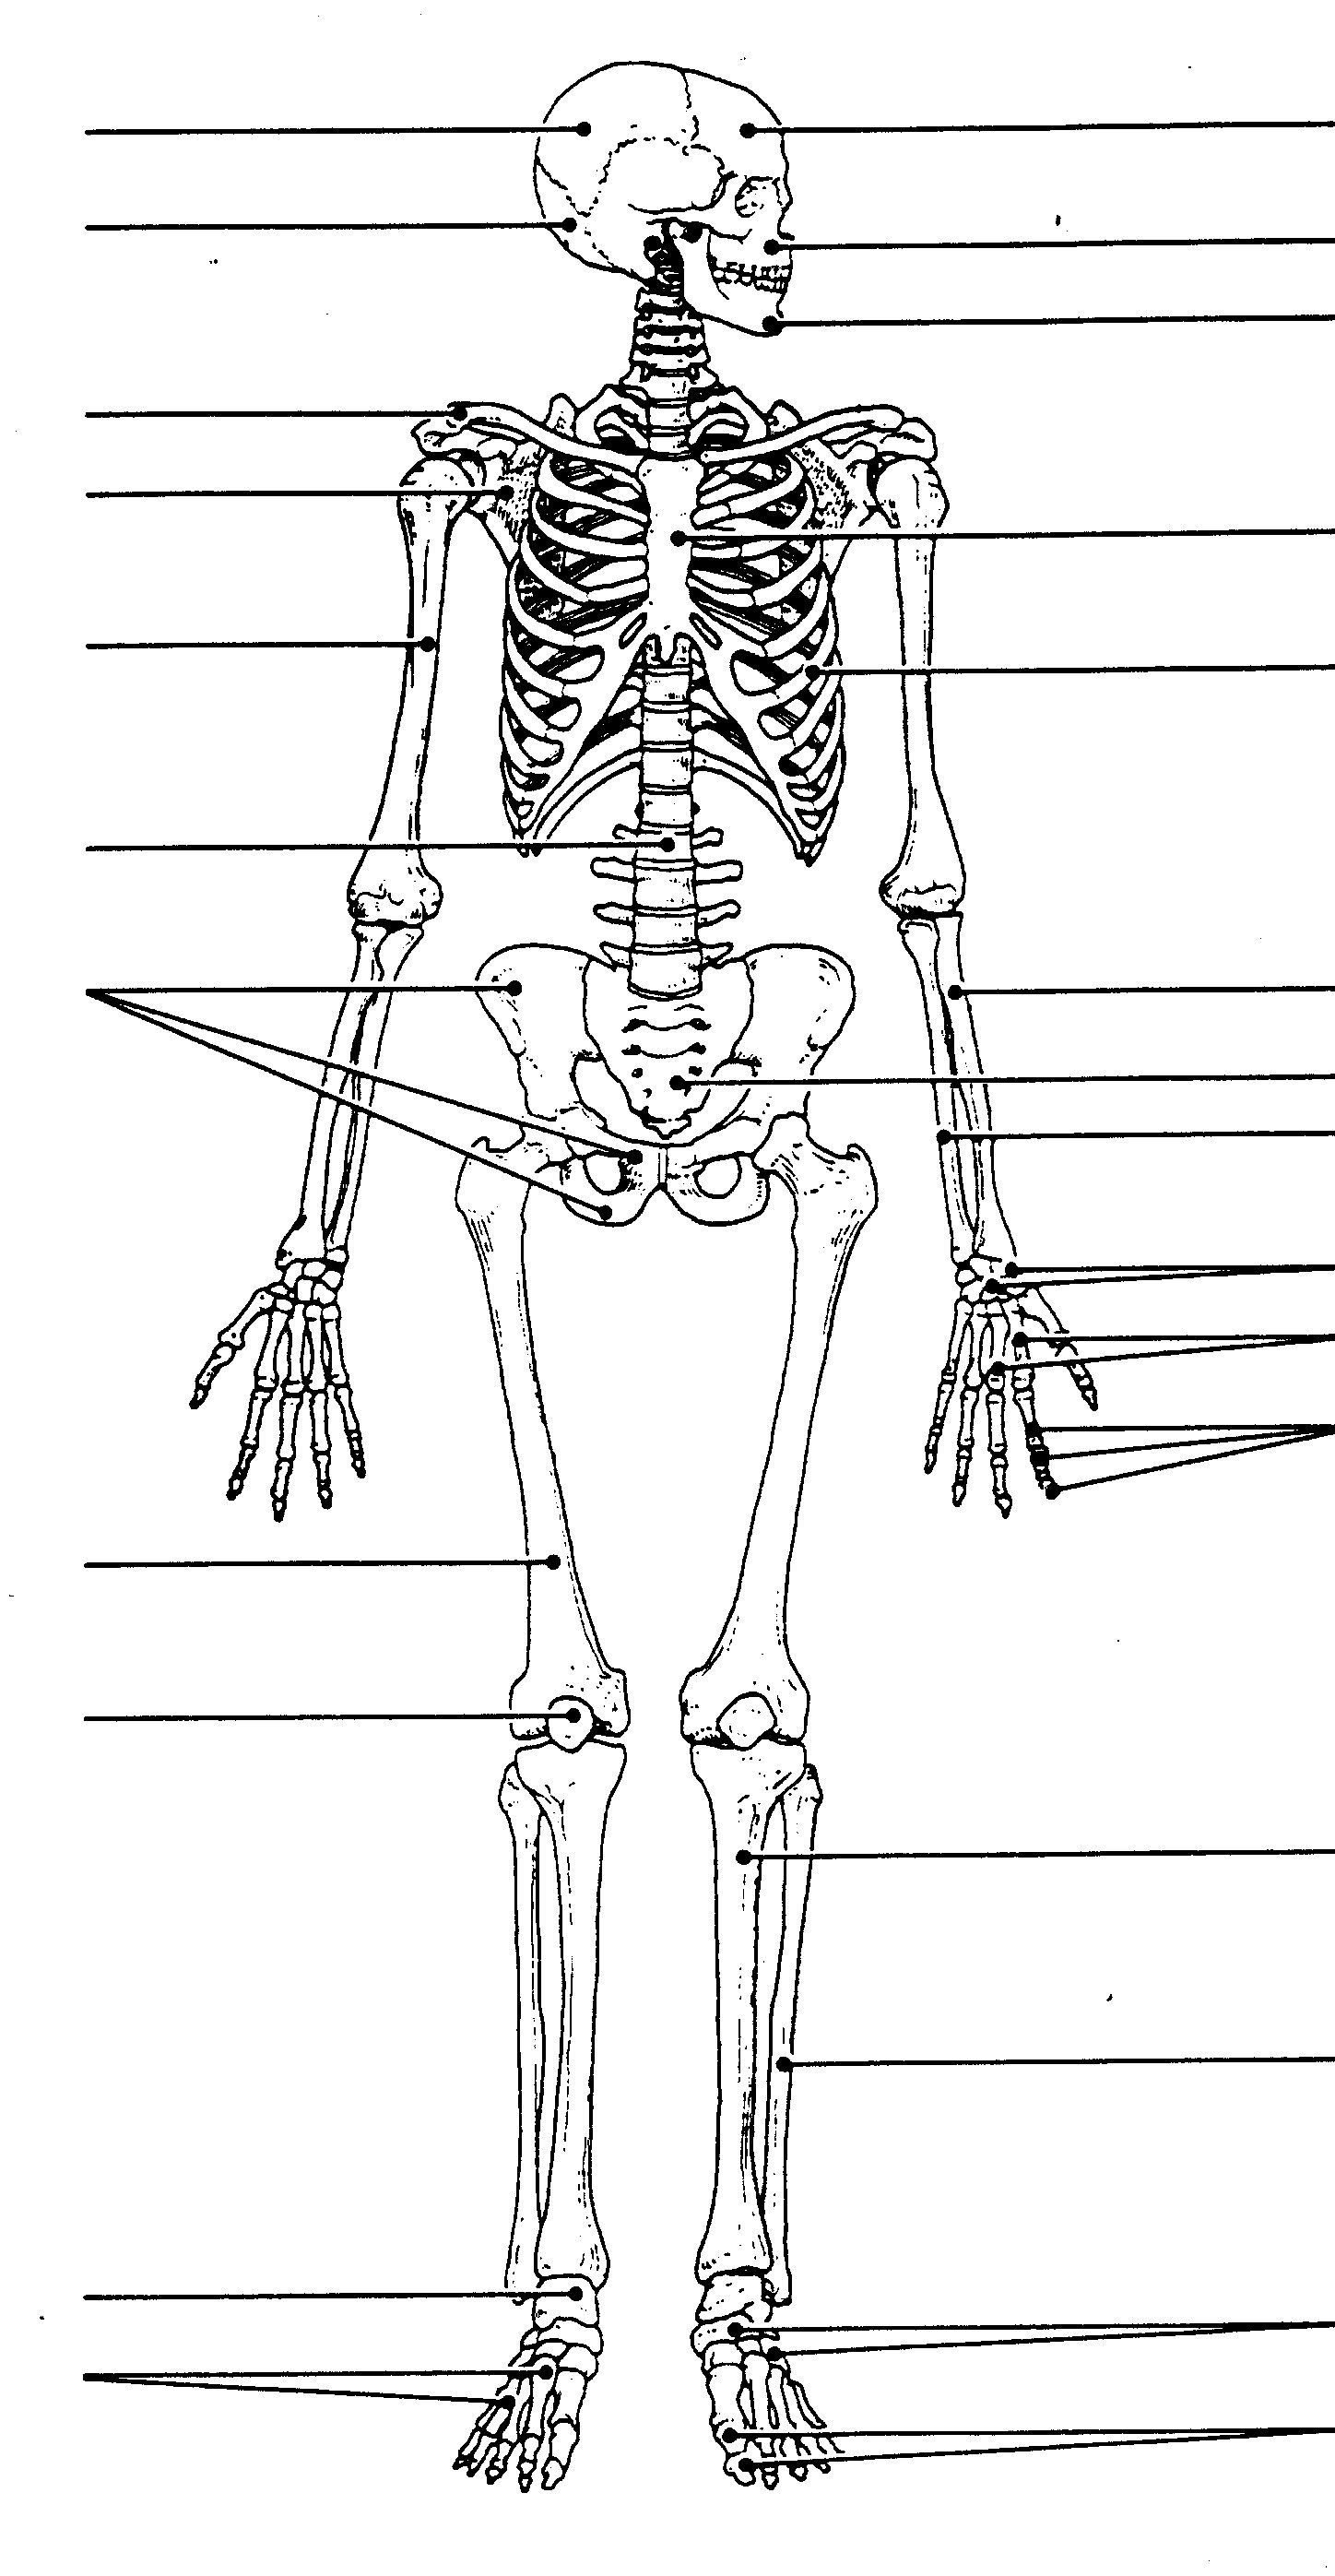 body skeleton diagram blank blog wiring diagram bones body diagram unlabeled [ 1448 x 2793 Pixel ]